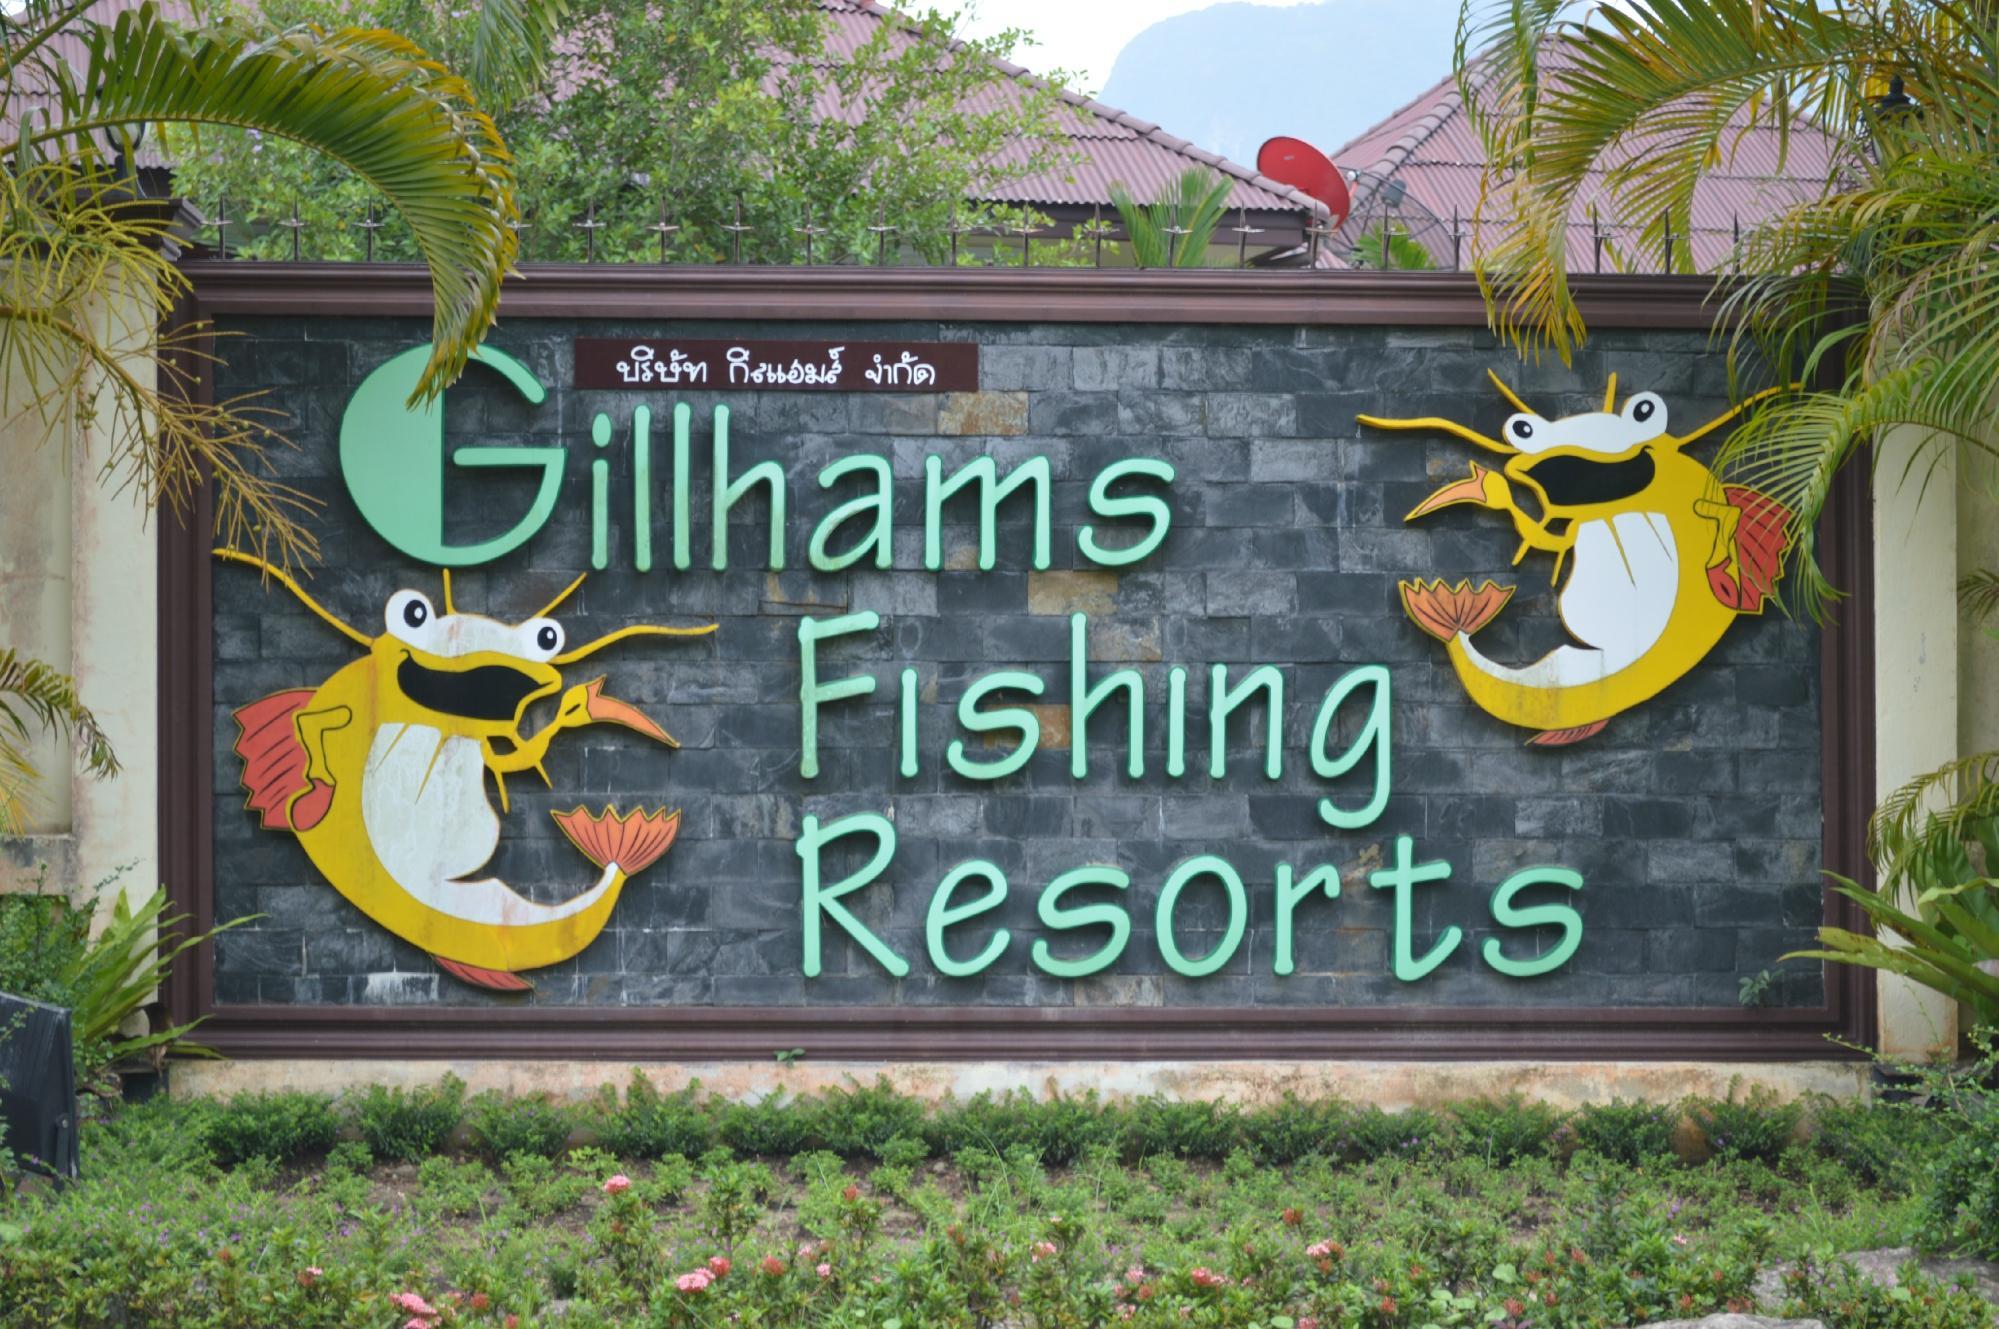 Gillhams Fishing Resorts